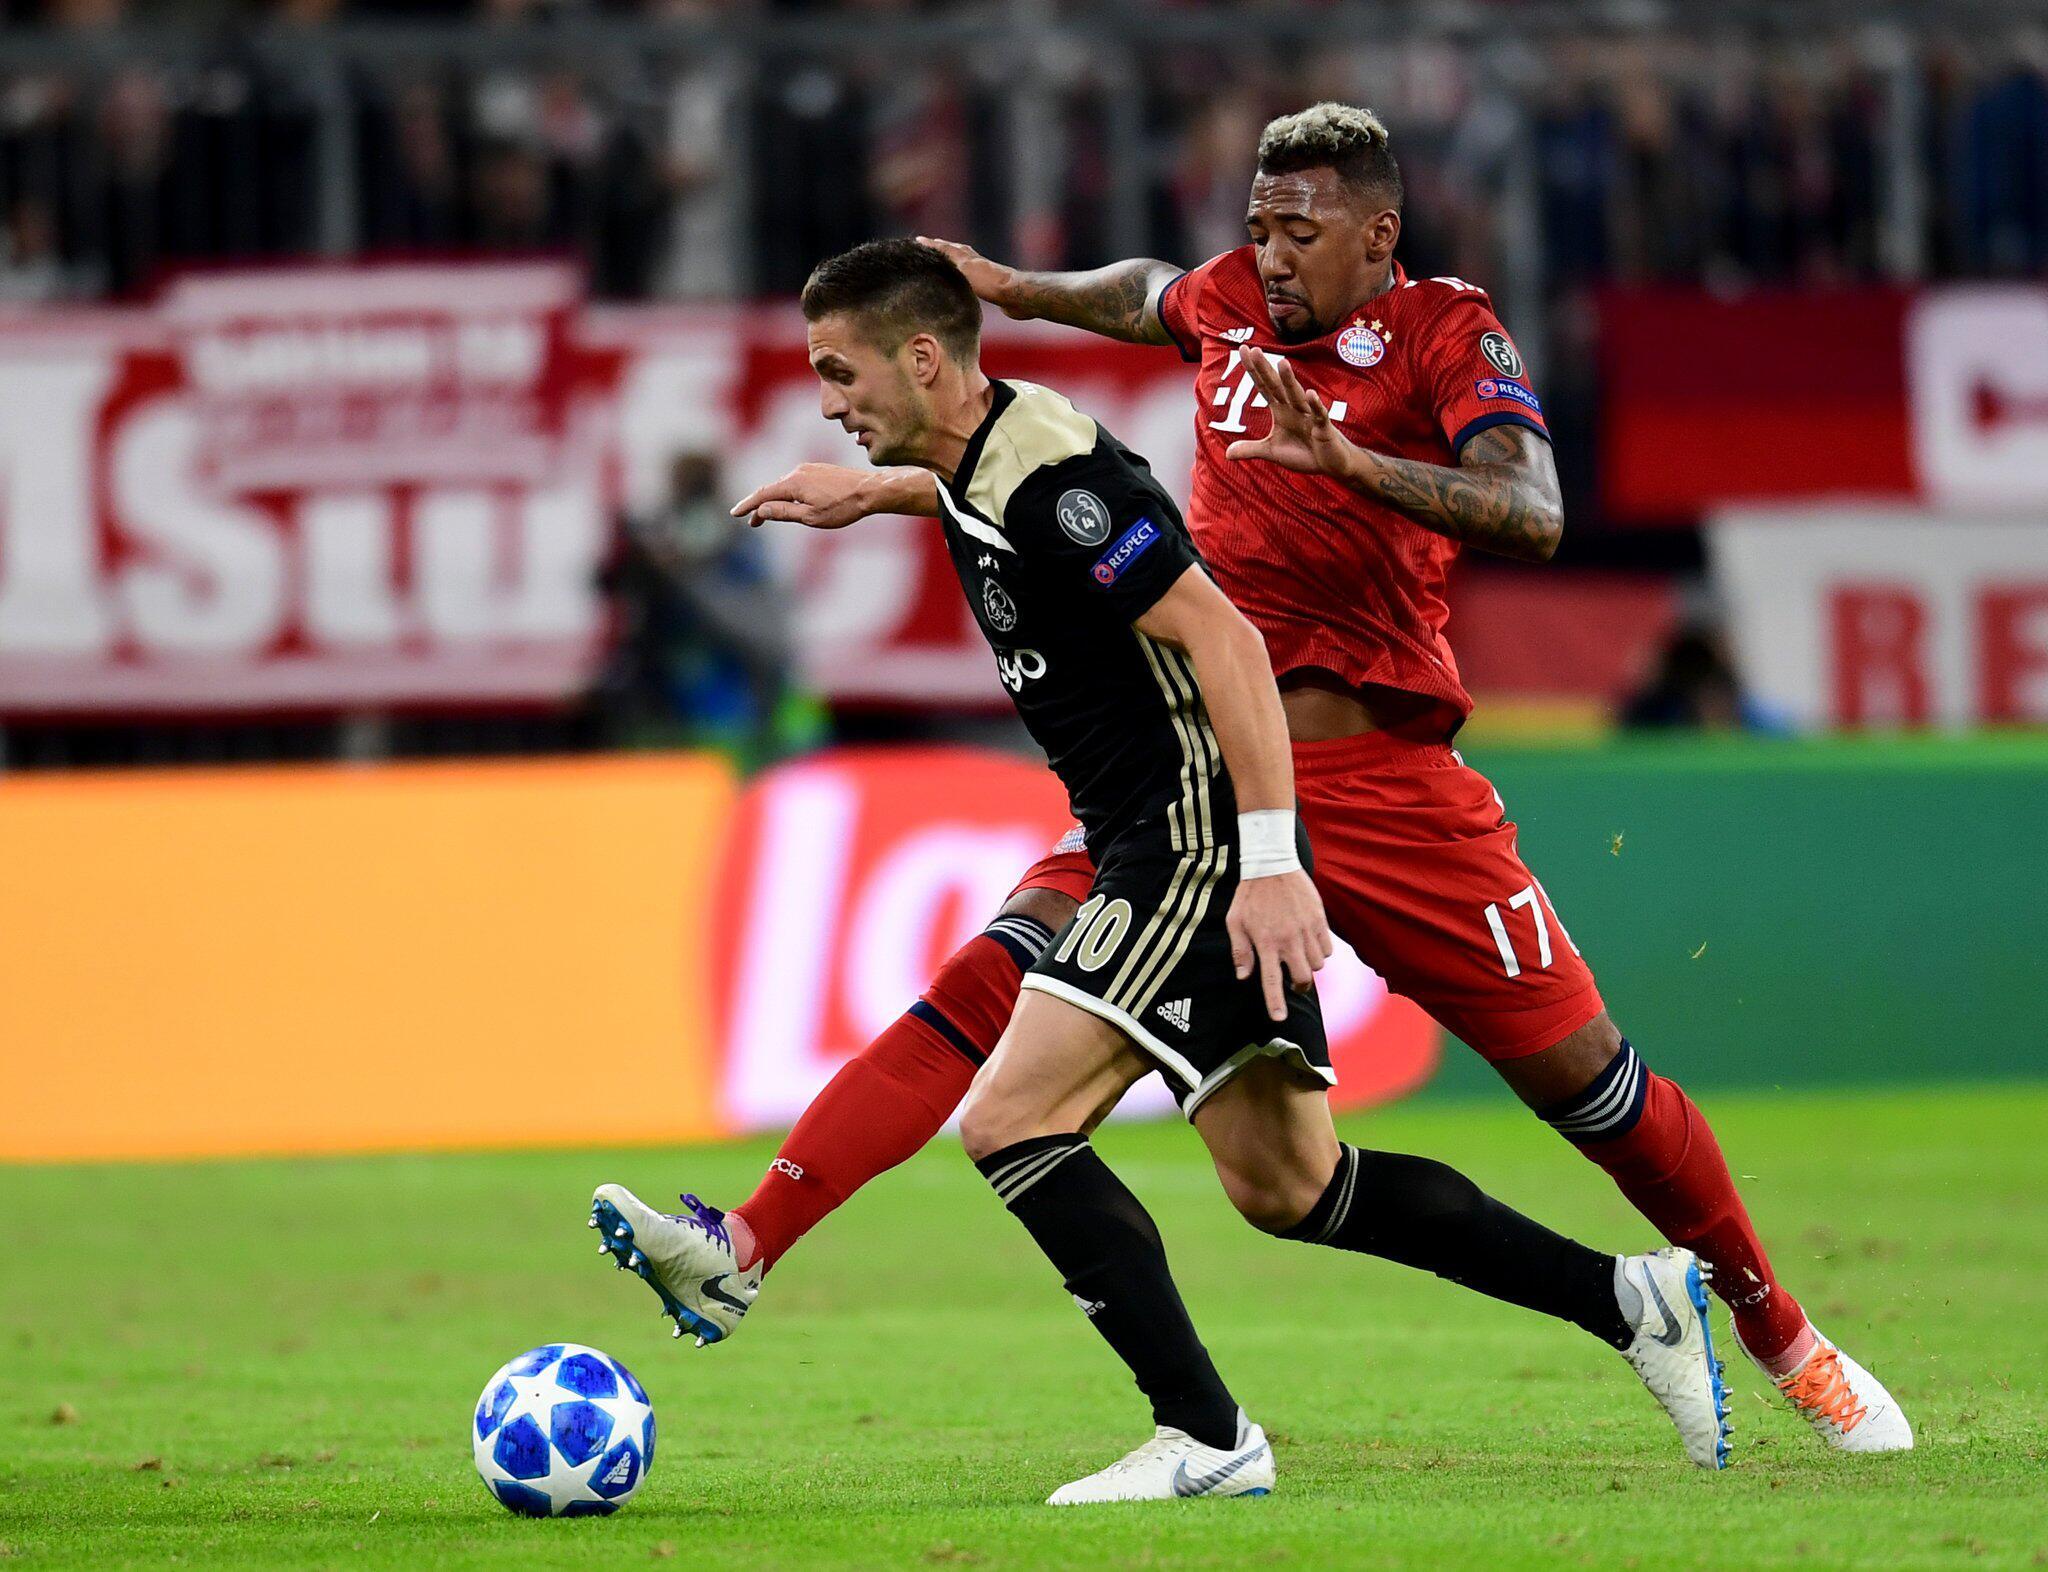 Bild zu UEFA Champions League - Bayern Munich vs Ajax Amsterdam